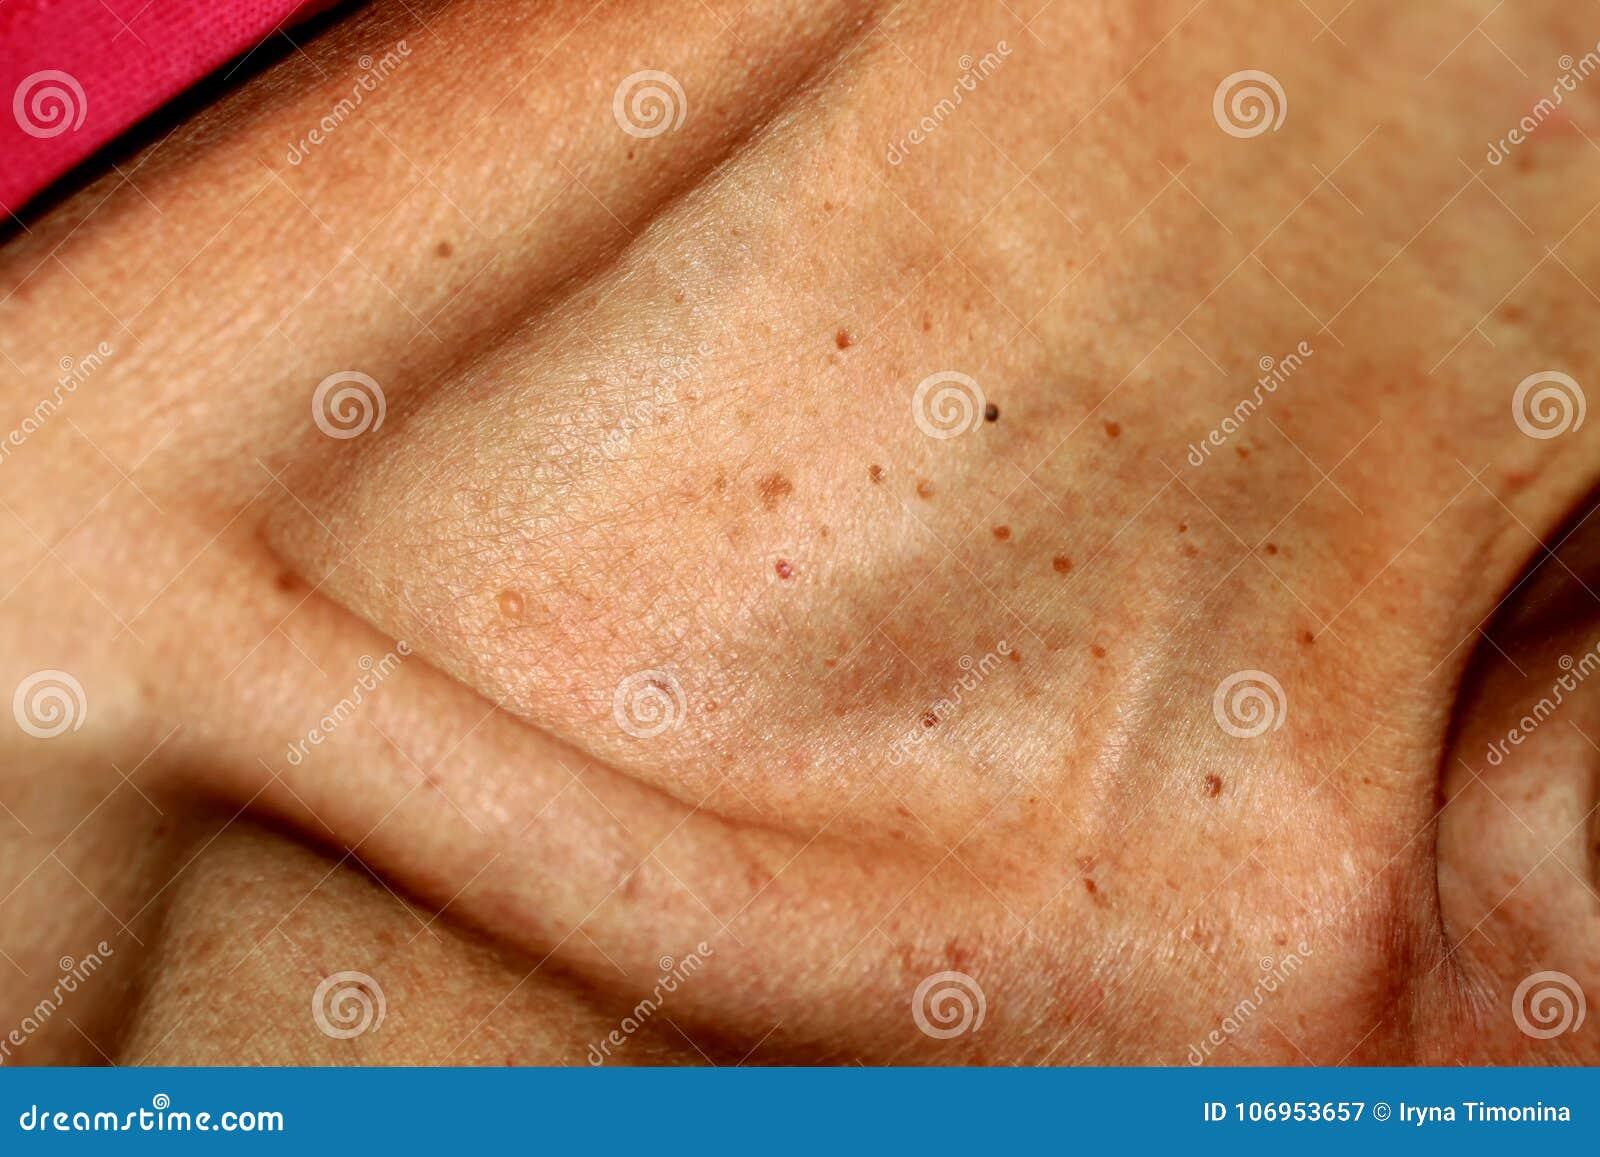 verruga genital papiloma humano human papillomavirus infection contagious